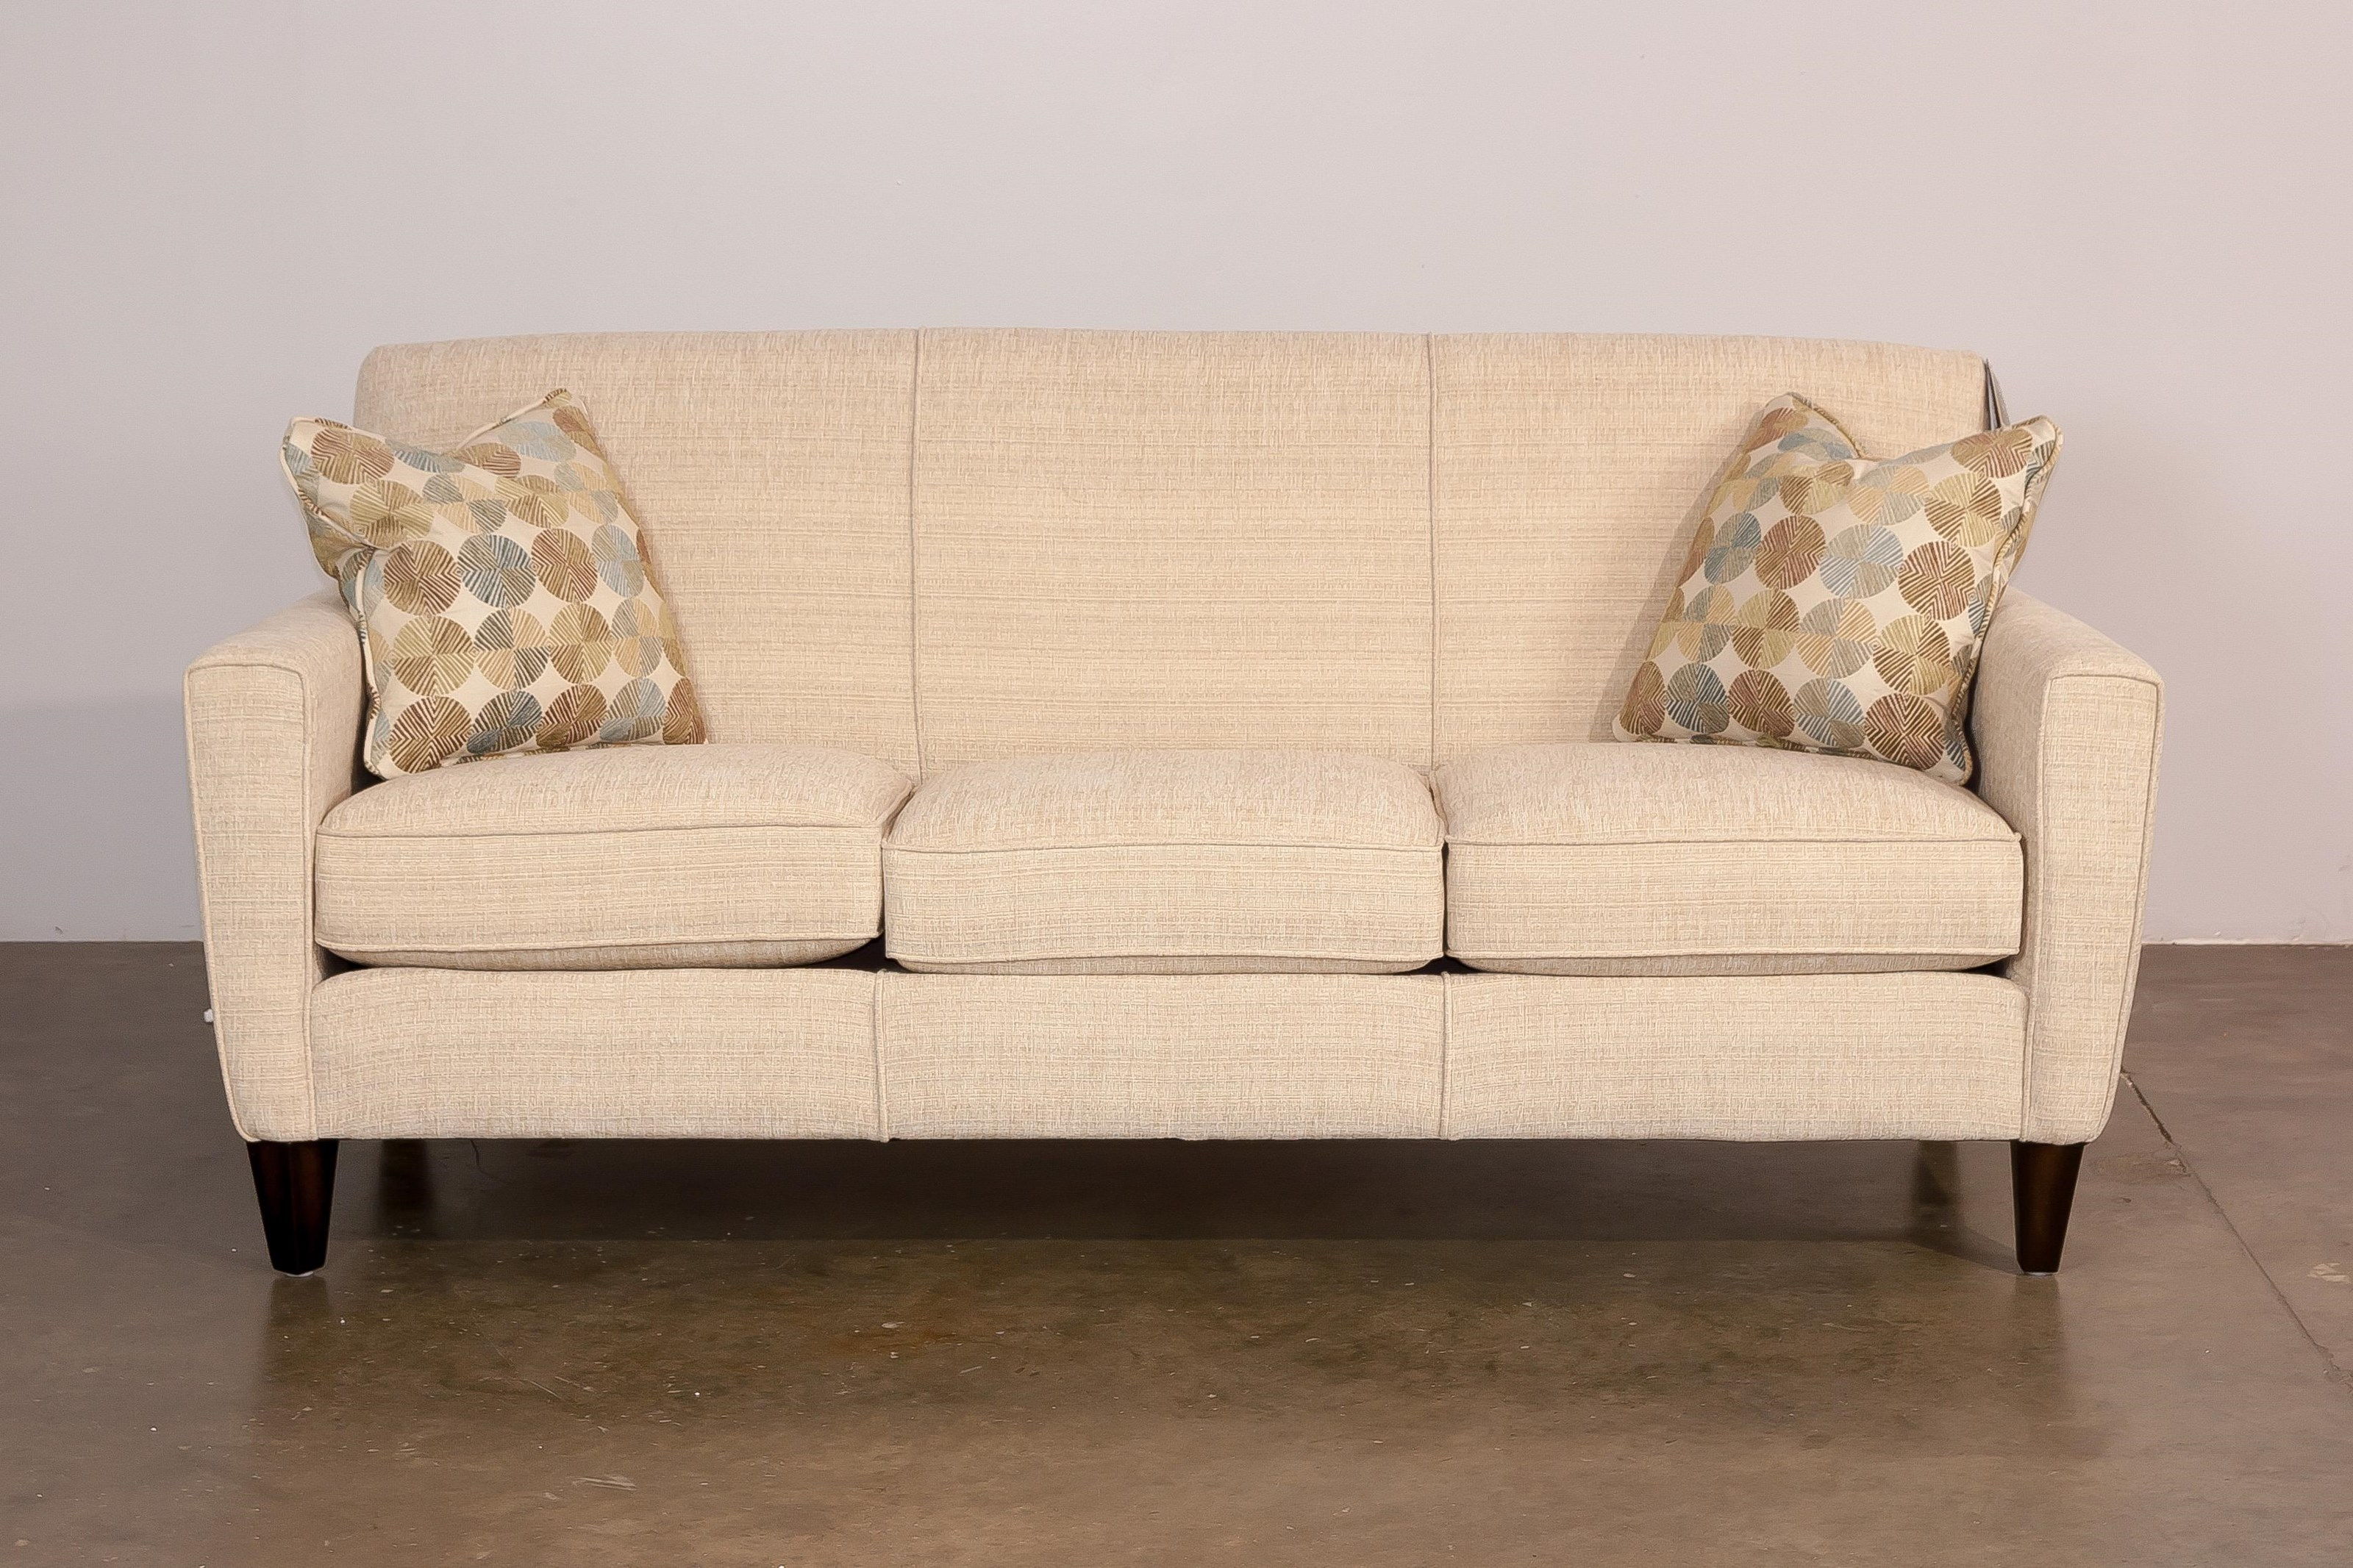 flexsteel digby sofa flexsteel digby loveseat thesofa. Black Bedroom Furniture Sets. Home Design Ideas